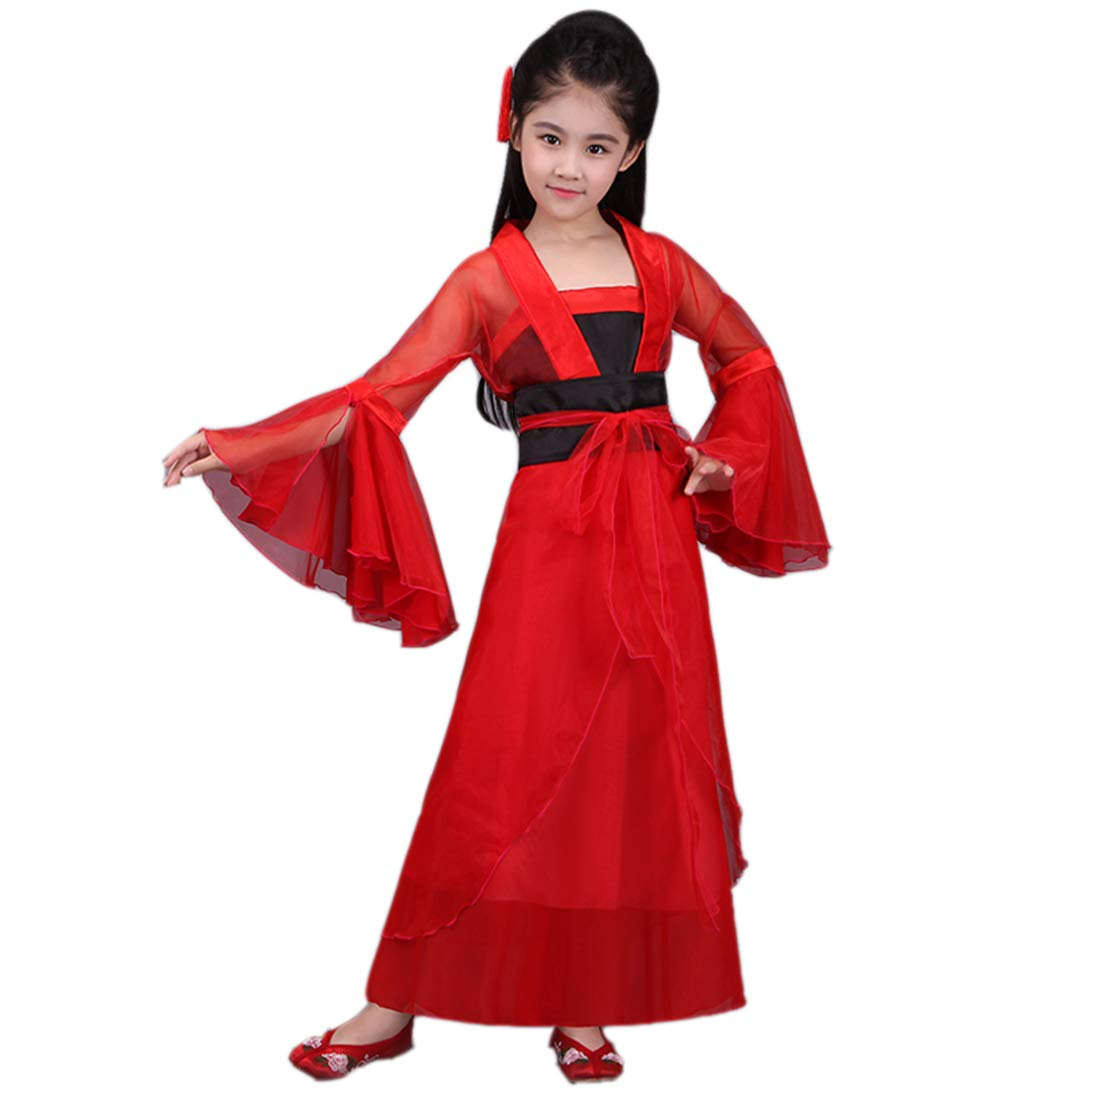 Amazon.com: Ez-sofei - Disfraz de Hanfu tradicional chino ...